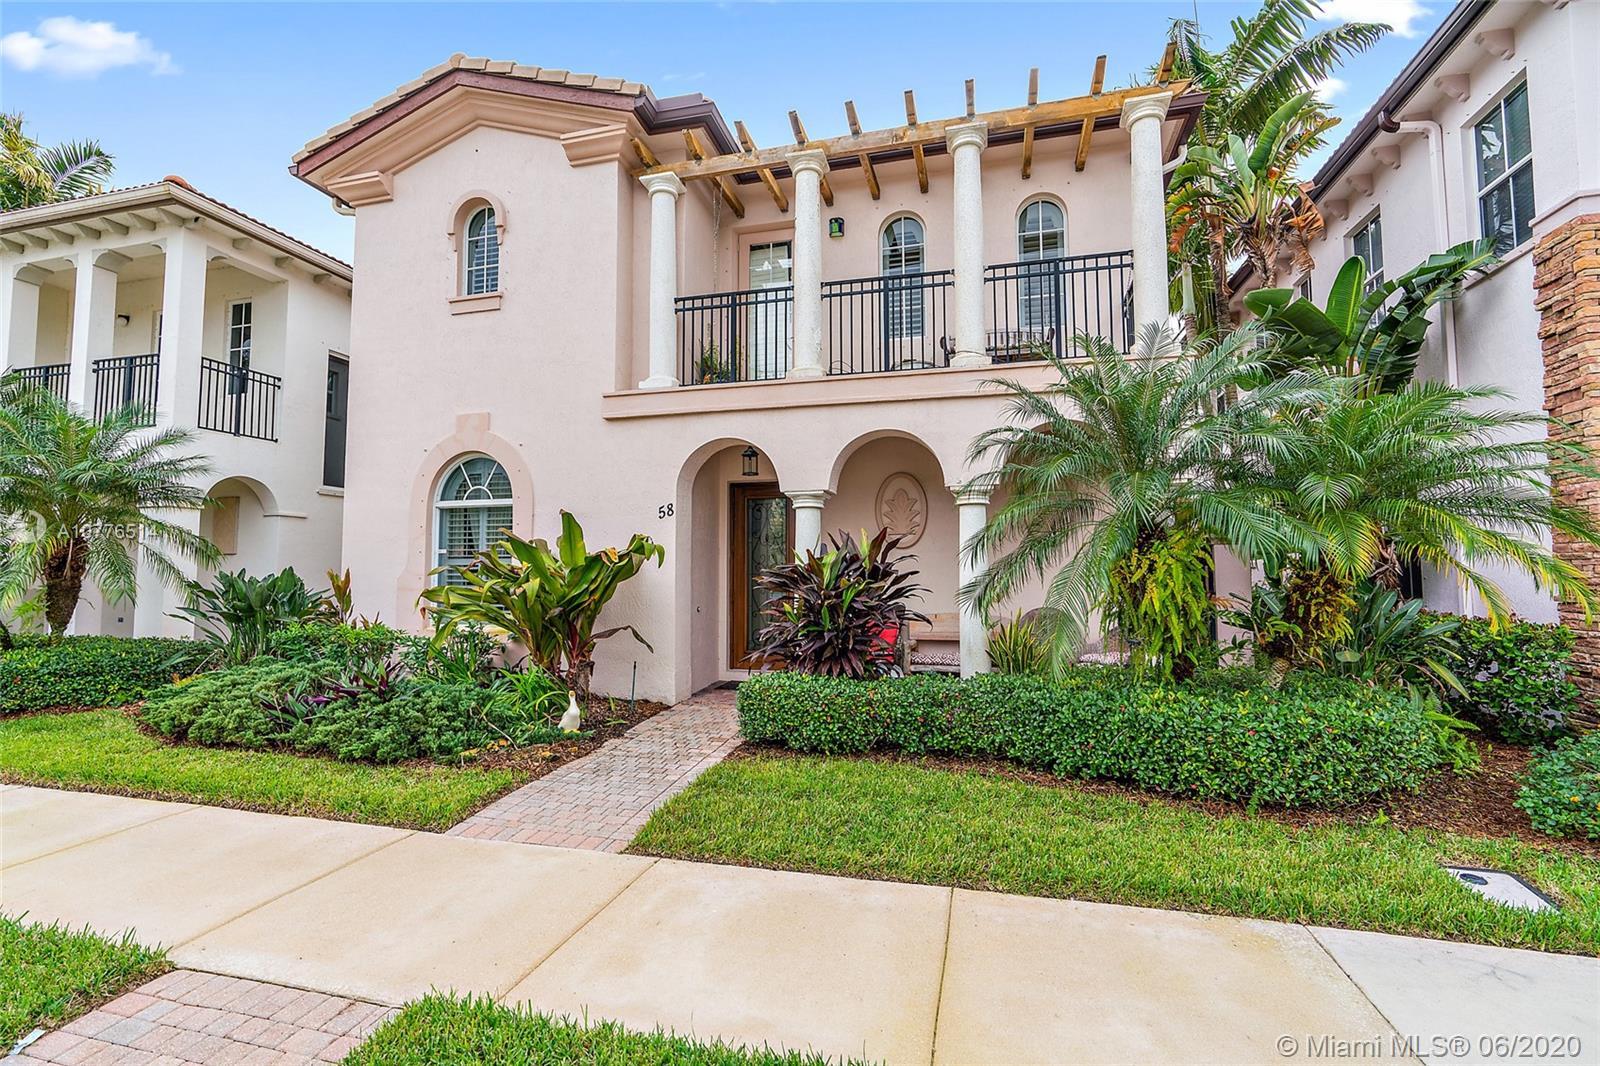 58 Stoney Drive, Palm Beach Gardens, FL 33410